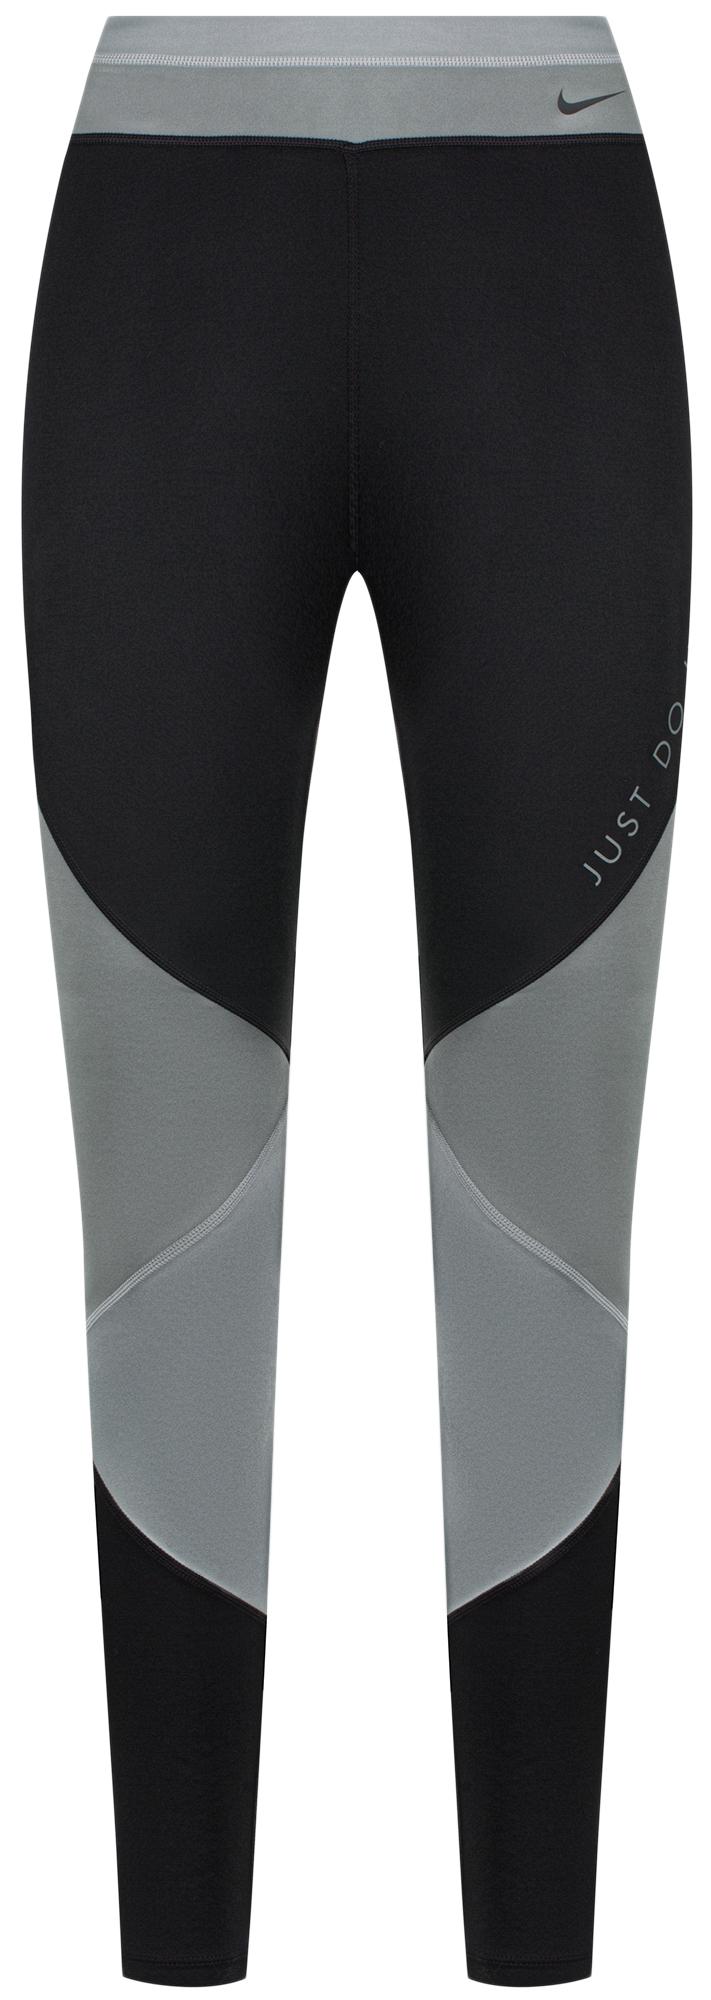 цена на Nike Легинсы женские Nike One, размер 46-48